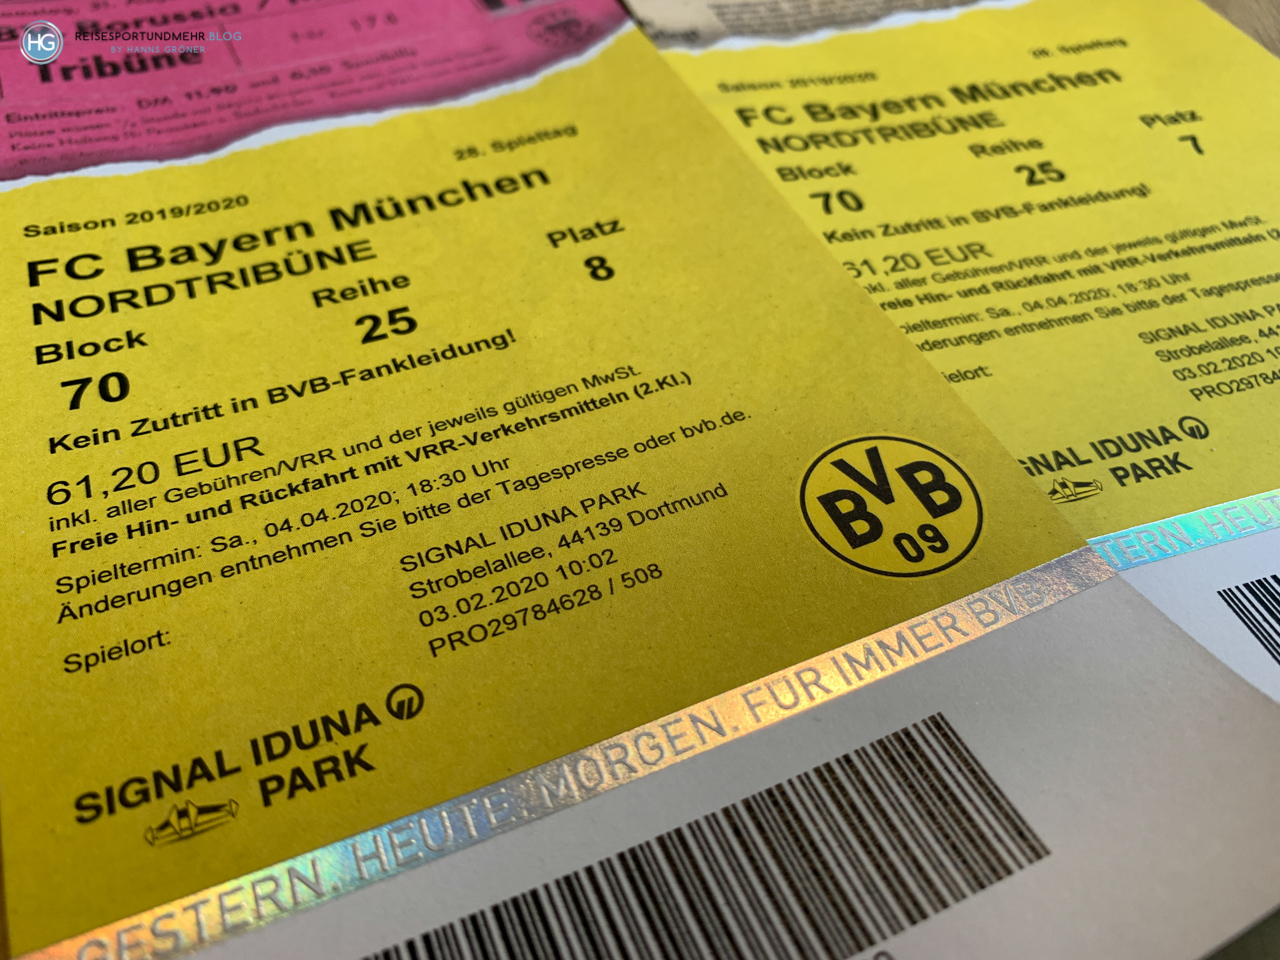 Stadionticket Dortmund - Bayern 2020 (Foto: Hanns Gröner)